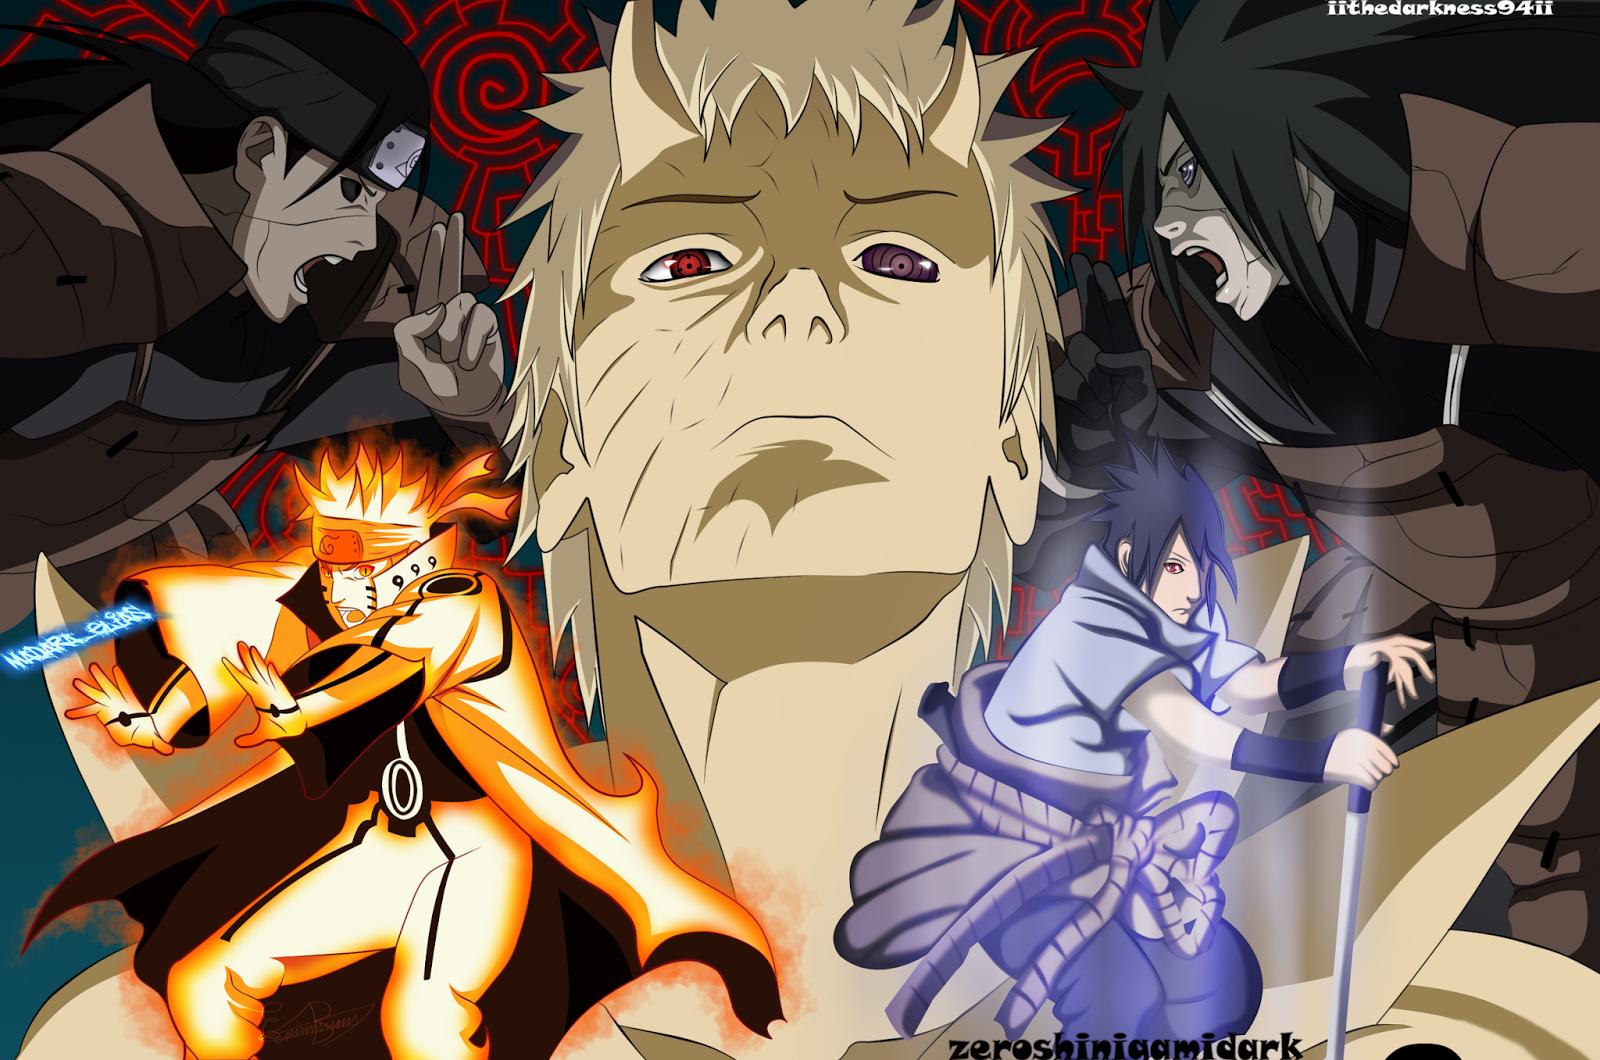 Dari Pesaing Terdekat Nya Yaitu One Piece Naruto Mempunyai Nilai Lebih Diantaranya 1 Karakter Yang Bagus 2 Jurus Keren